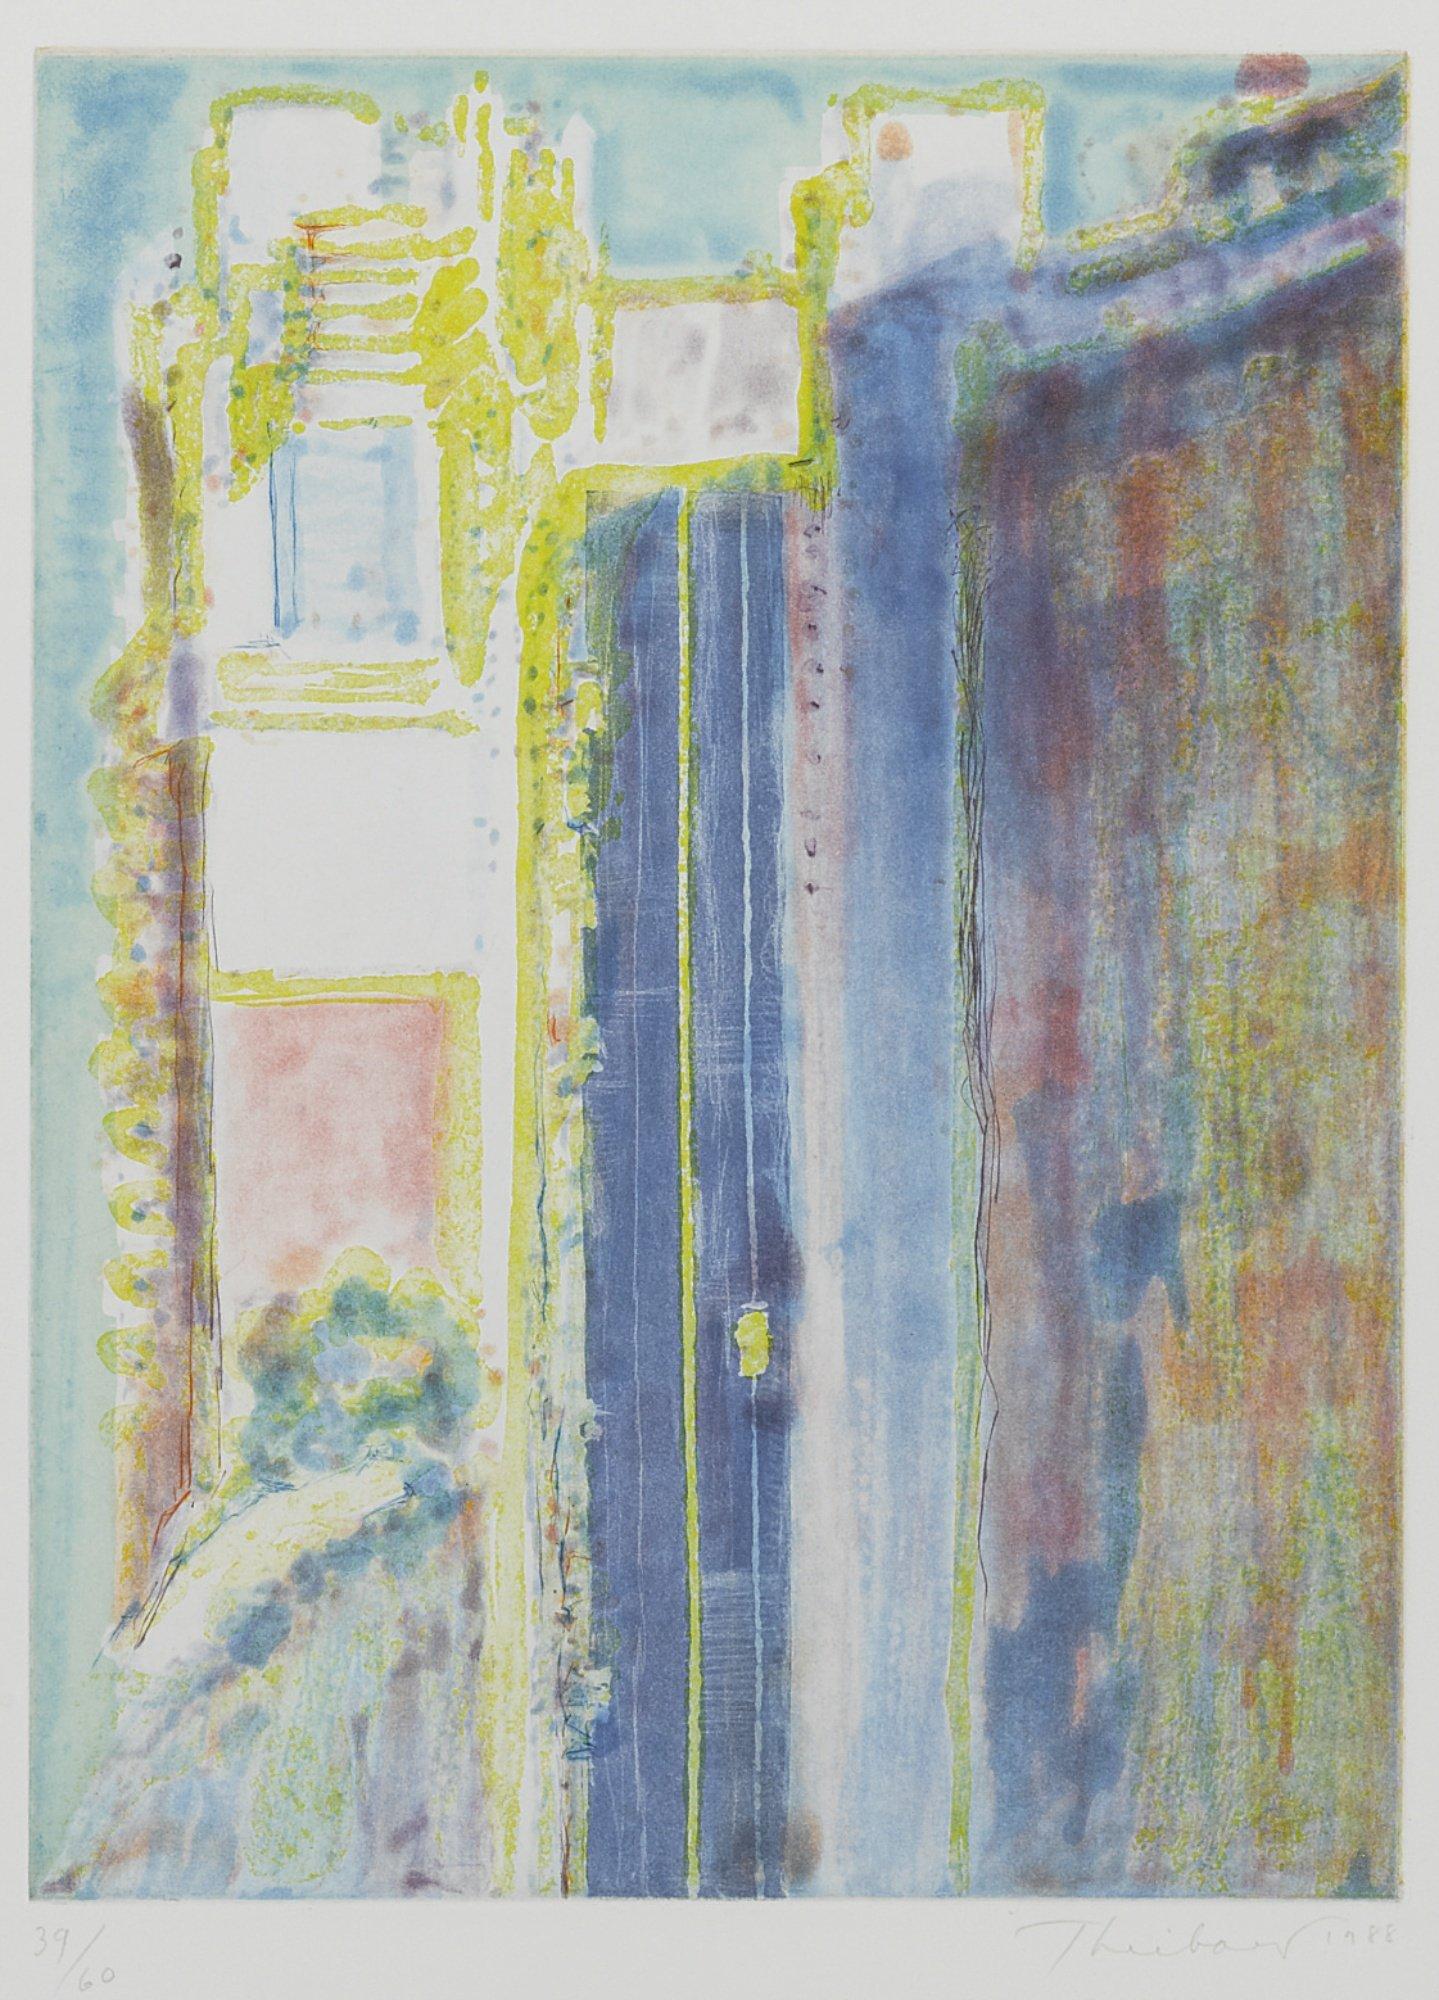 Wayne Thiebaud, City Edge 39/60, 1988